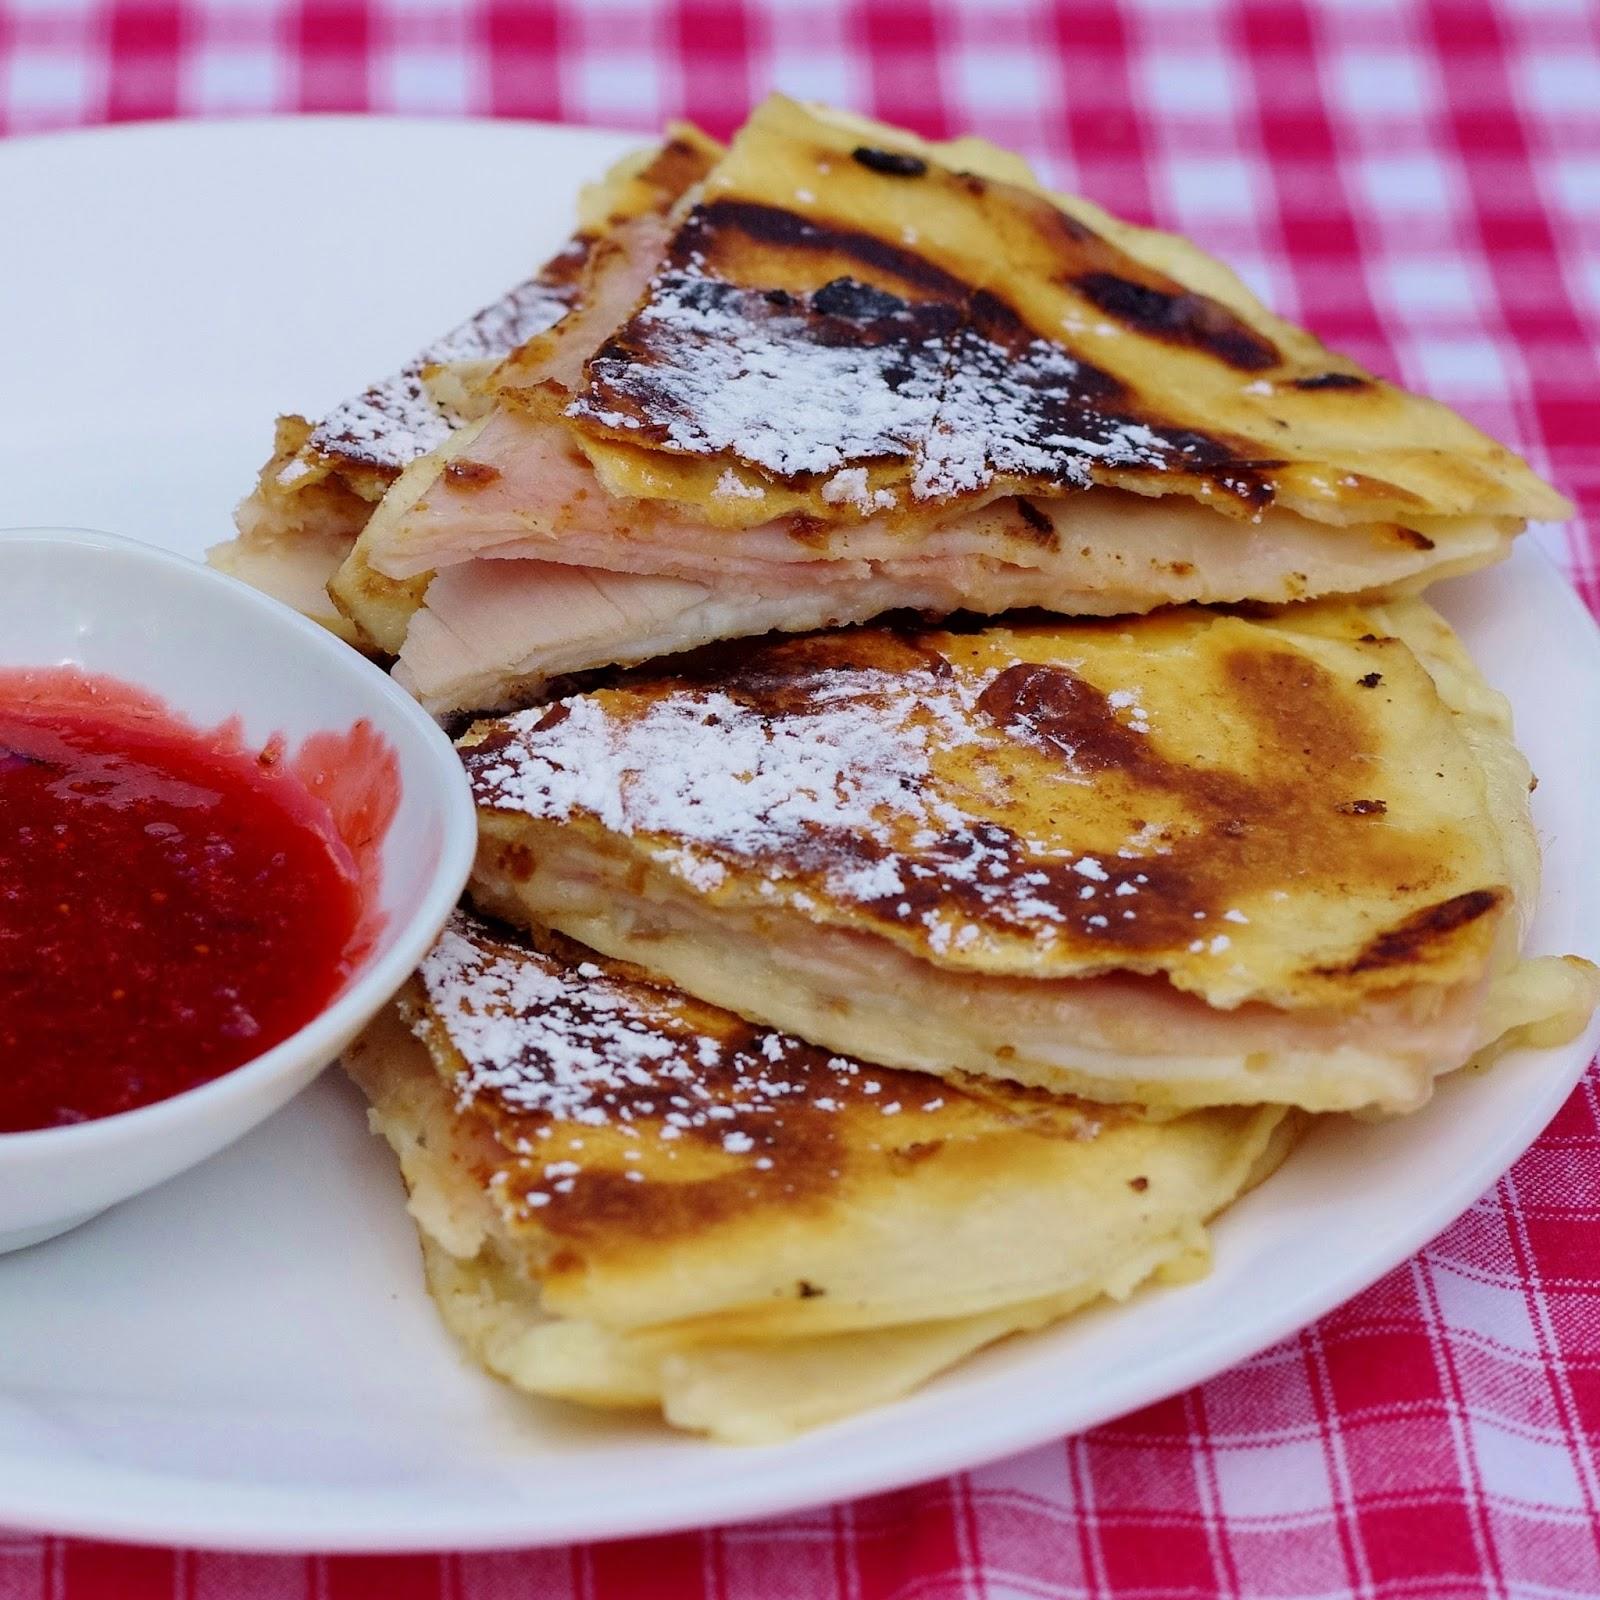 Sage Trifle: Monte Cristo Quesadillas